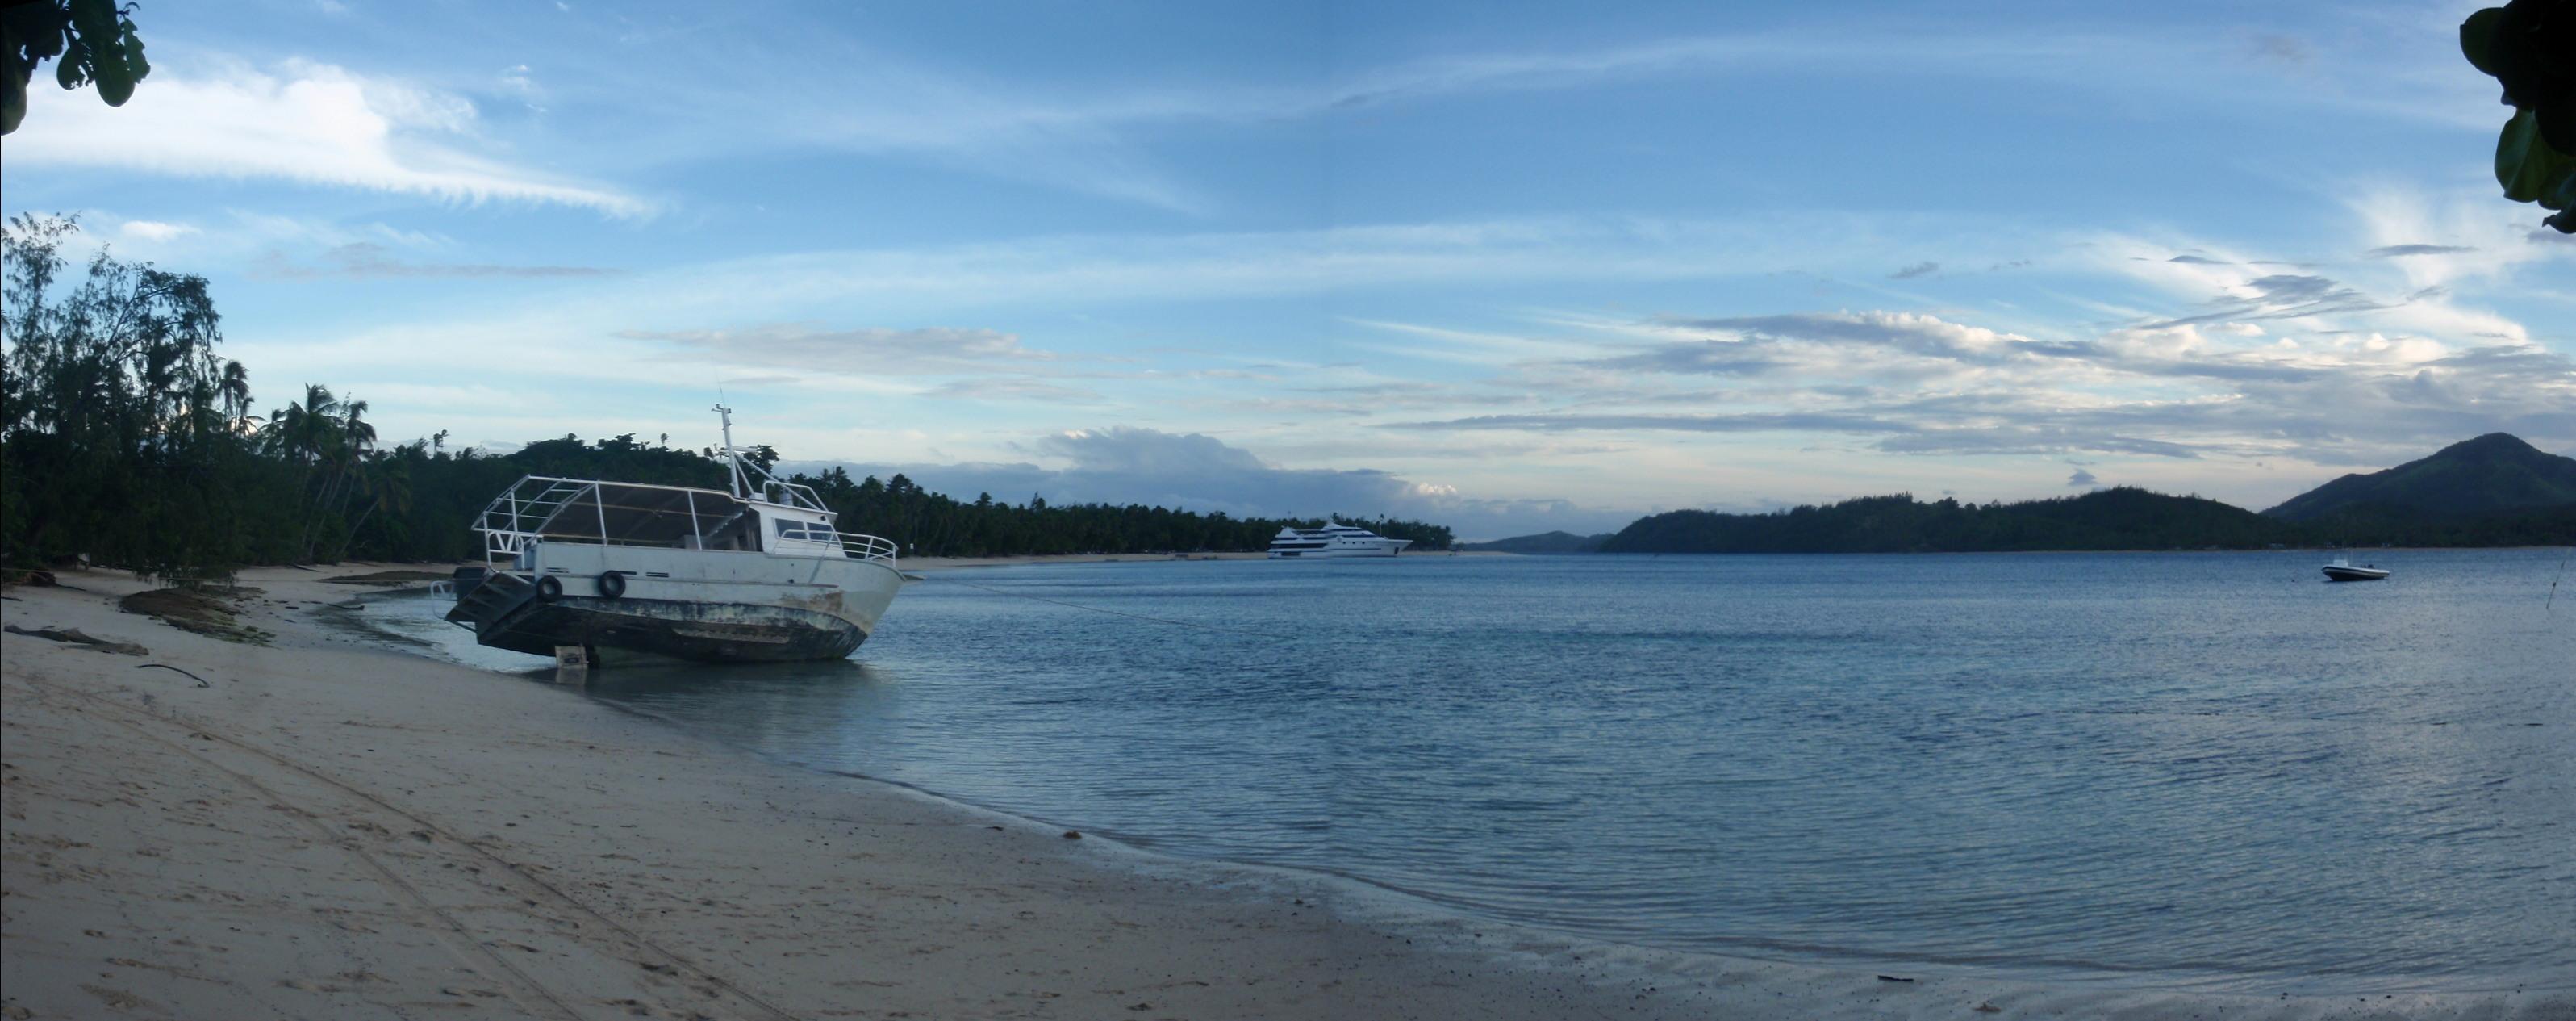 P4210013 Pano Fiji Blue Lagoon Nanuya Lailai